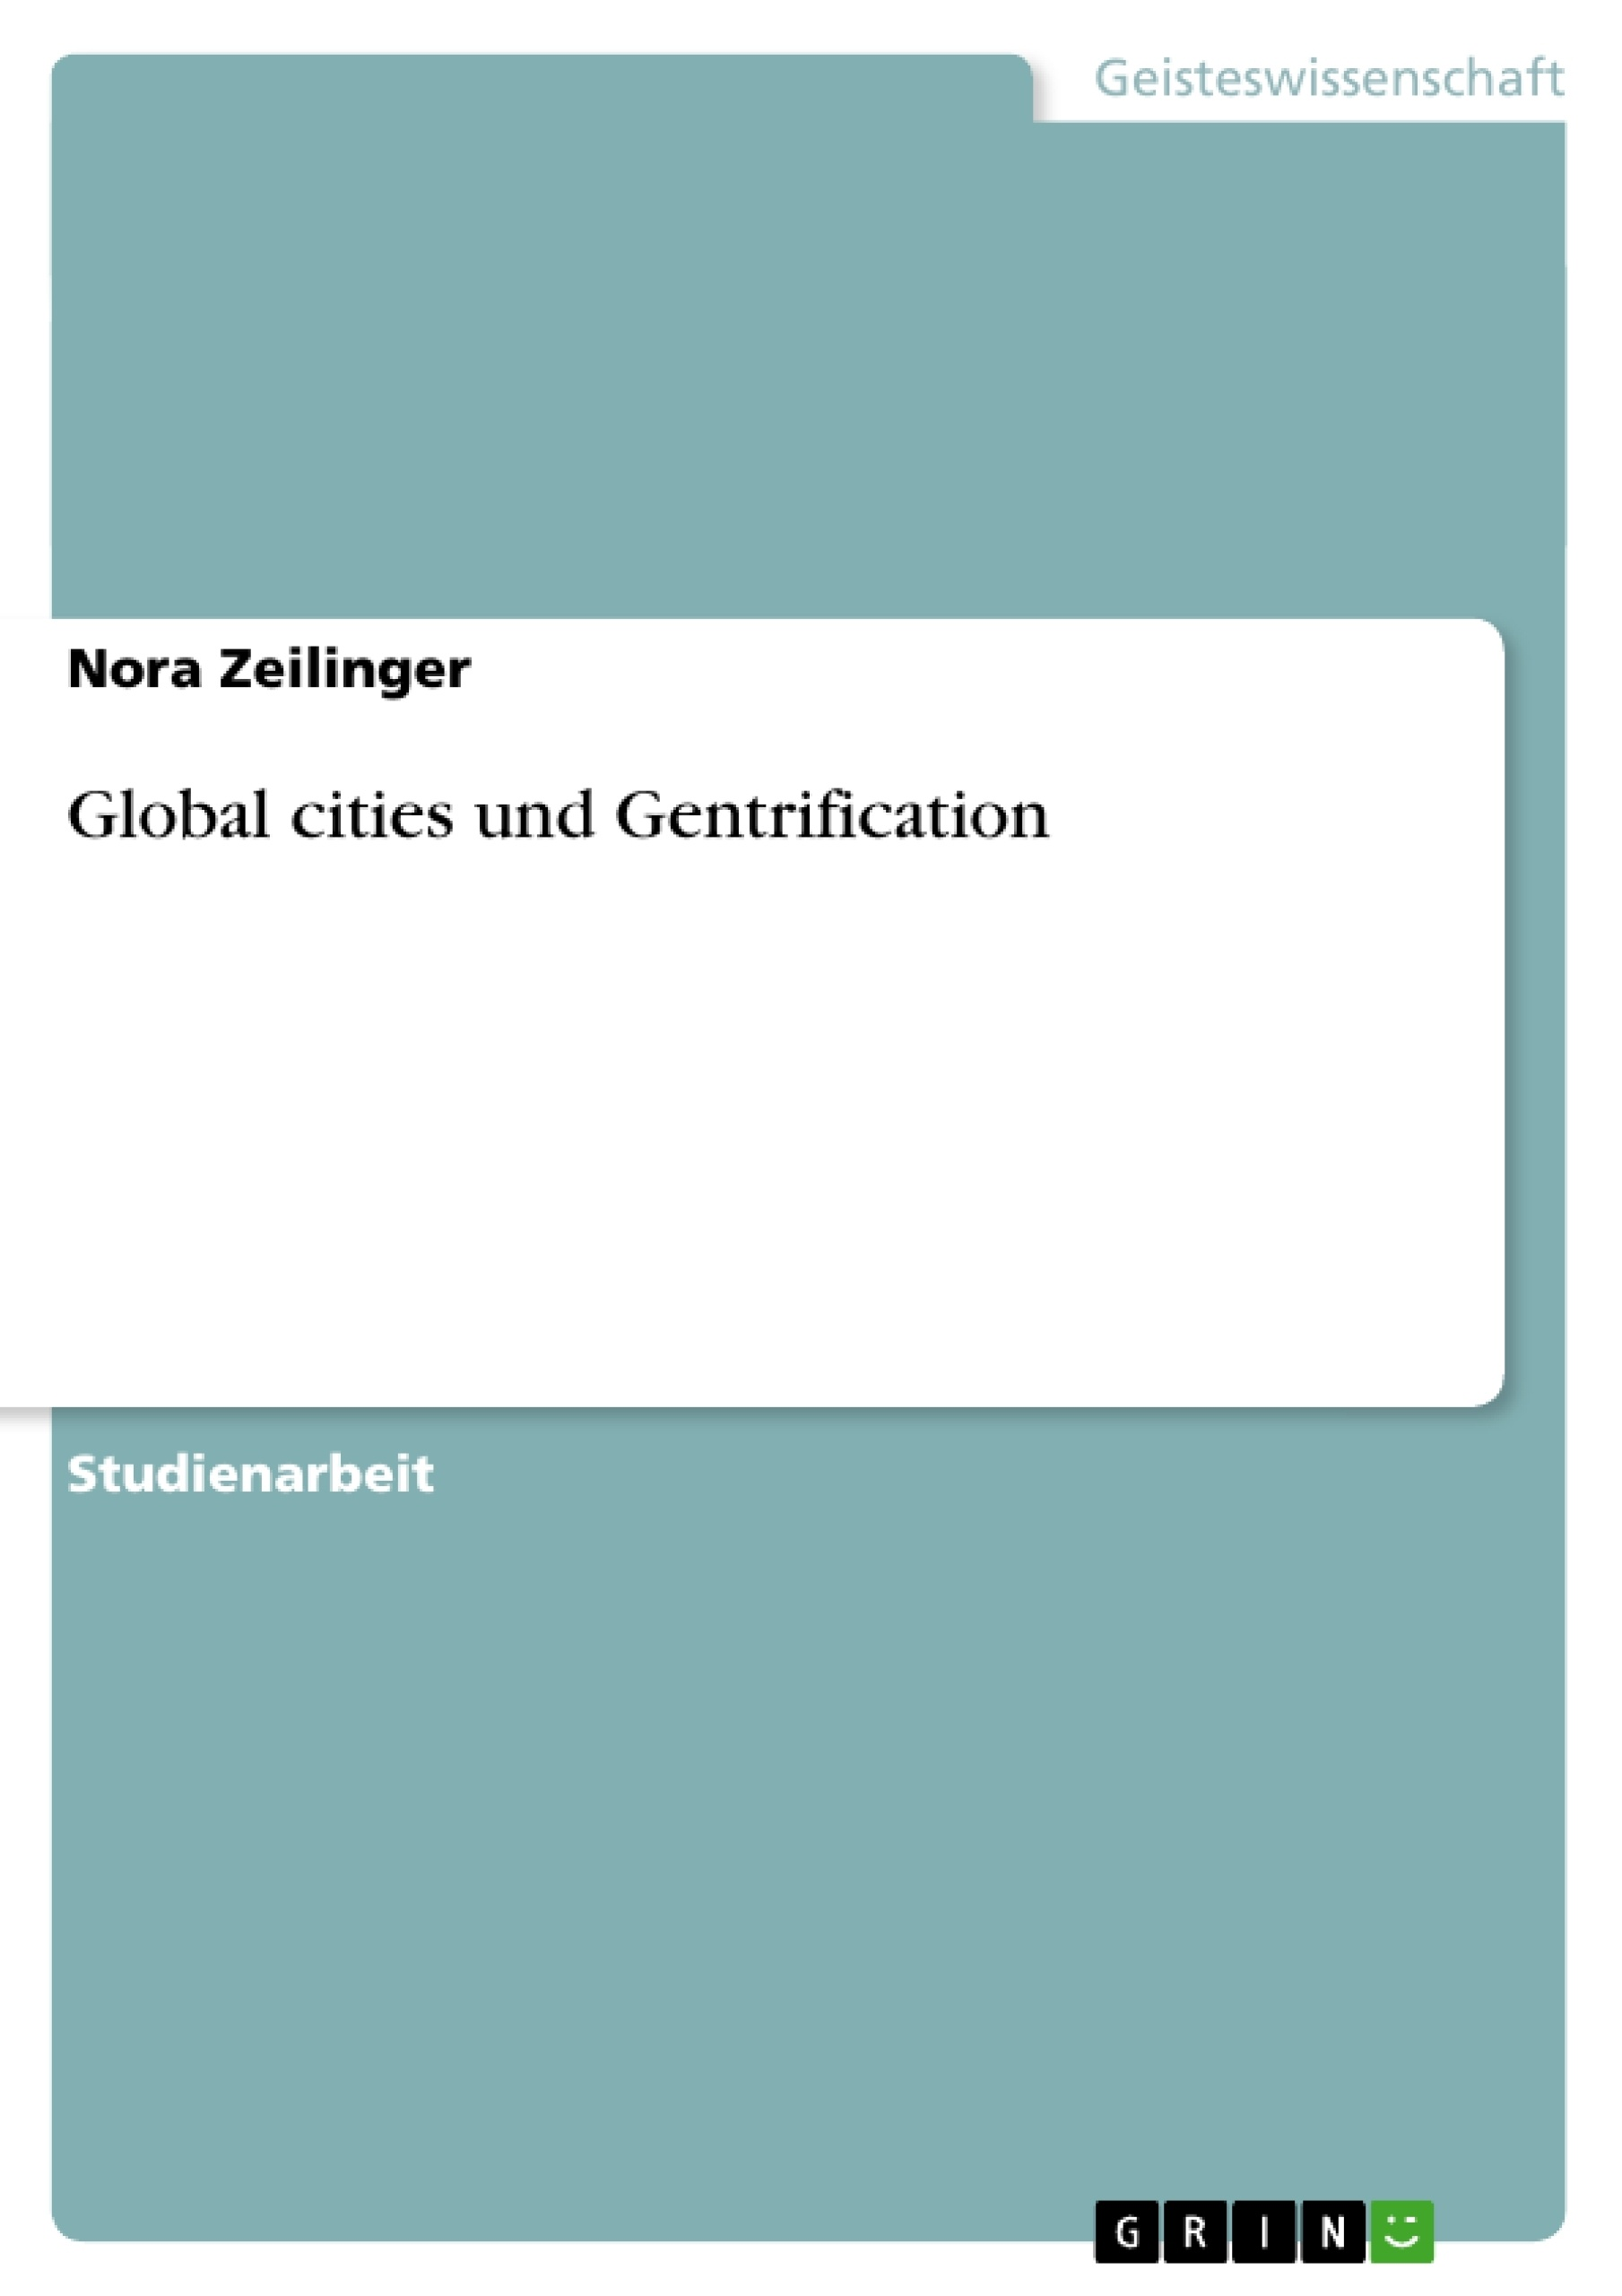 Titel: Global cities und Gentrification